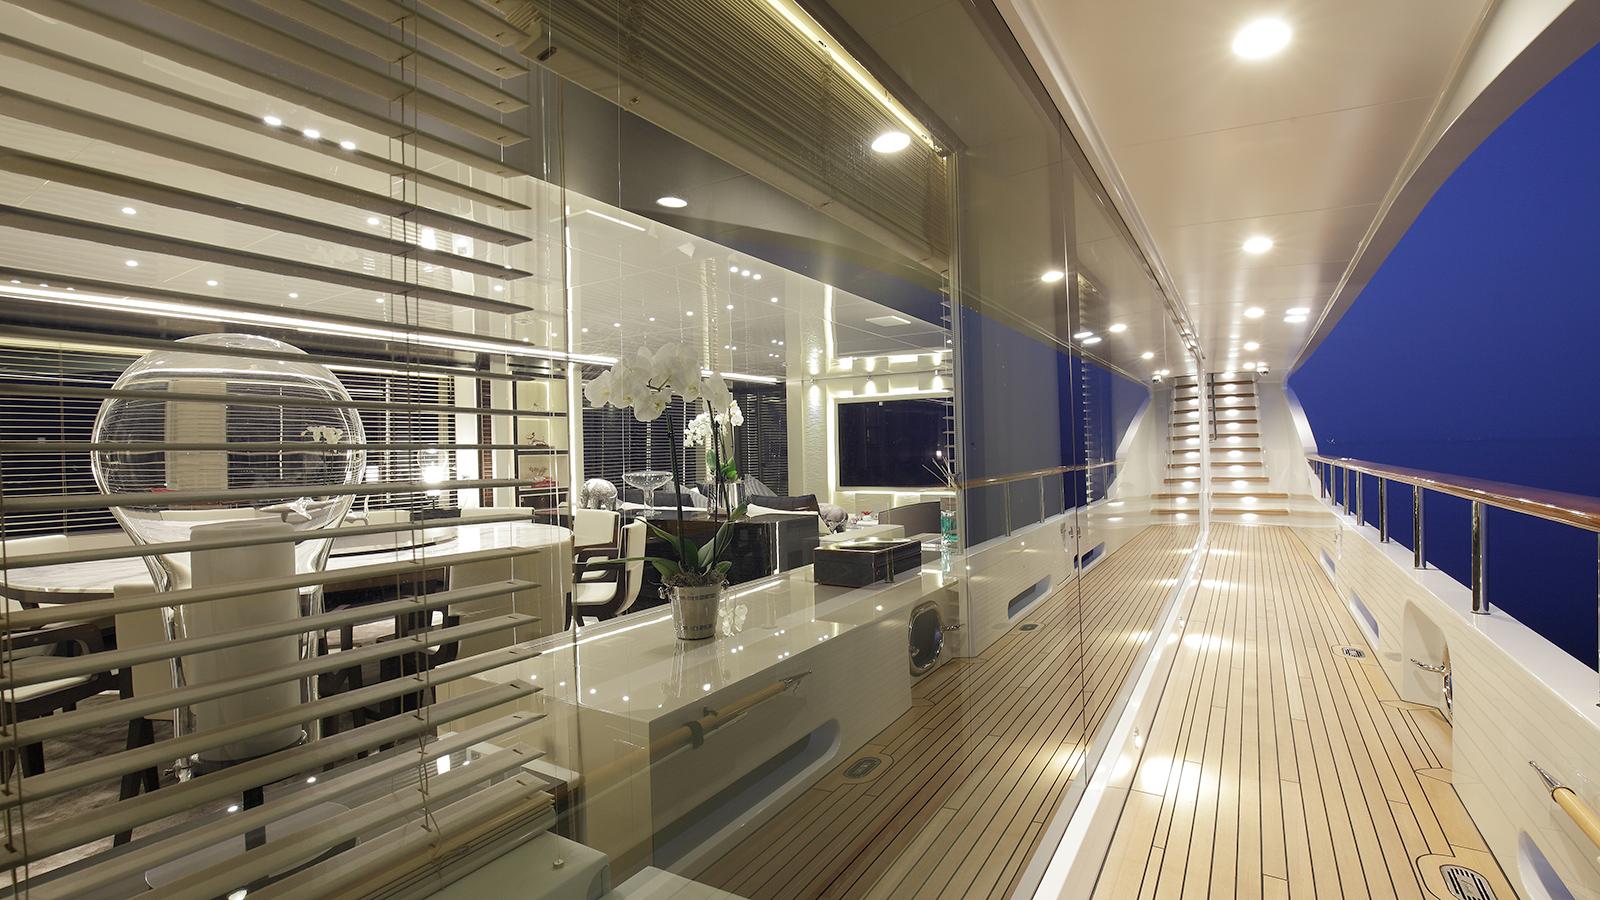 the-side-deck-of-benetti-custom-super-yacht-domani